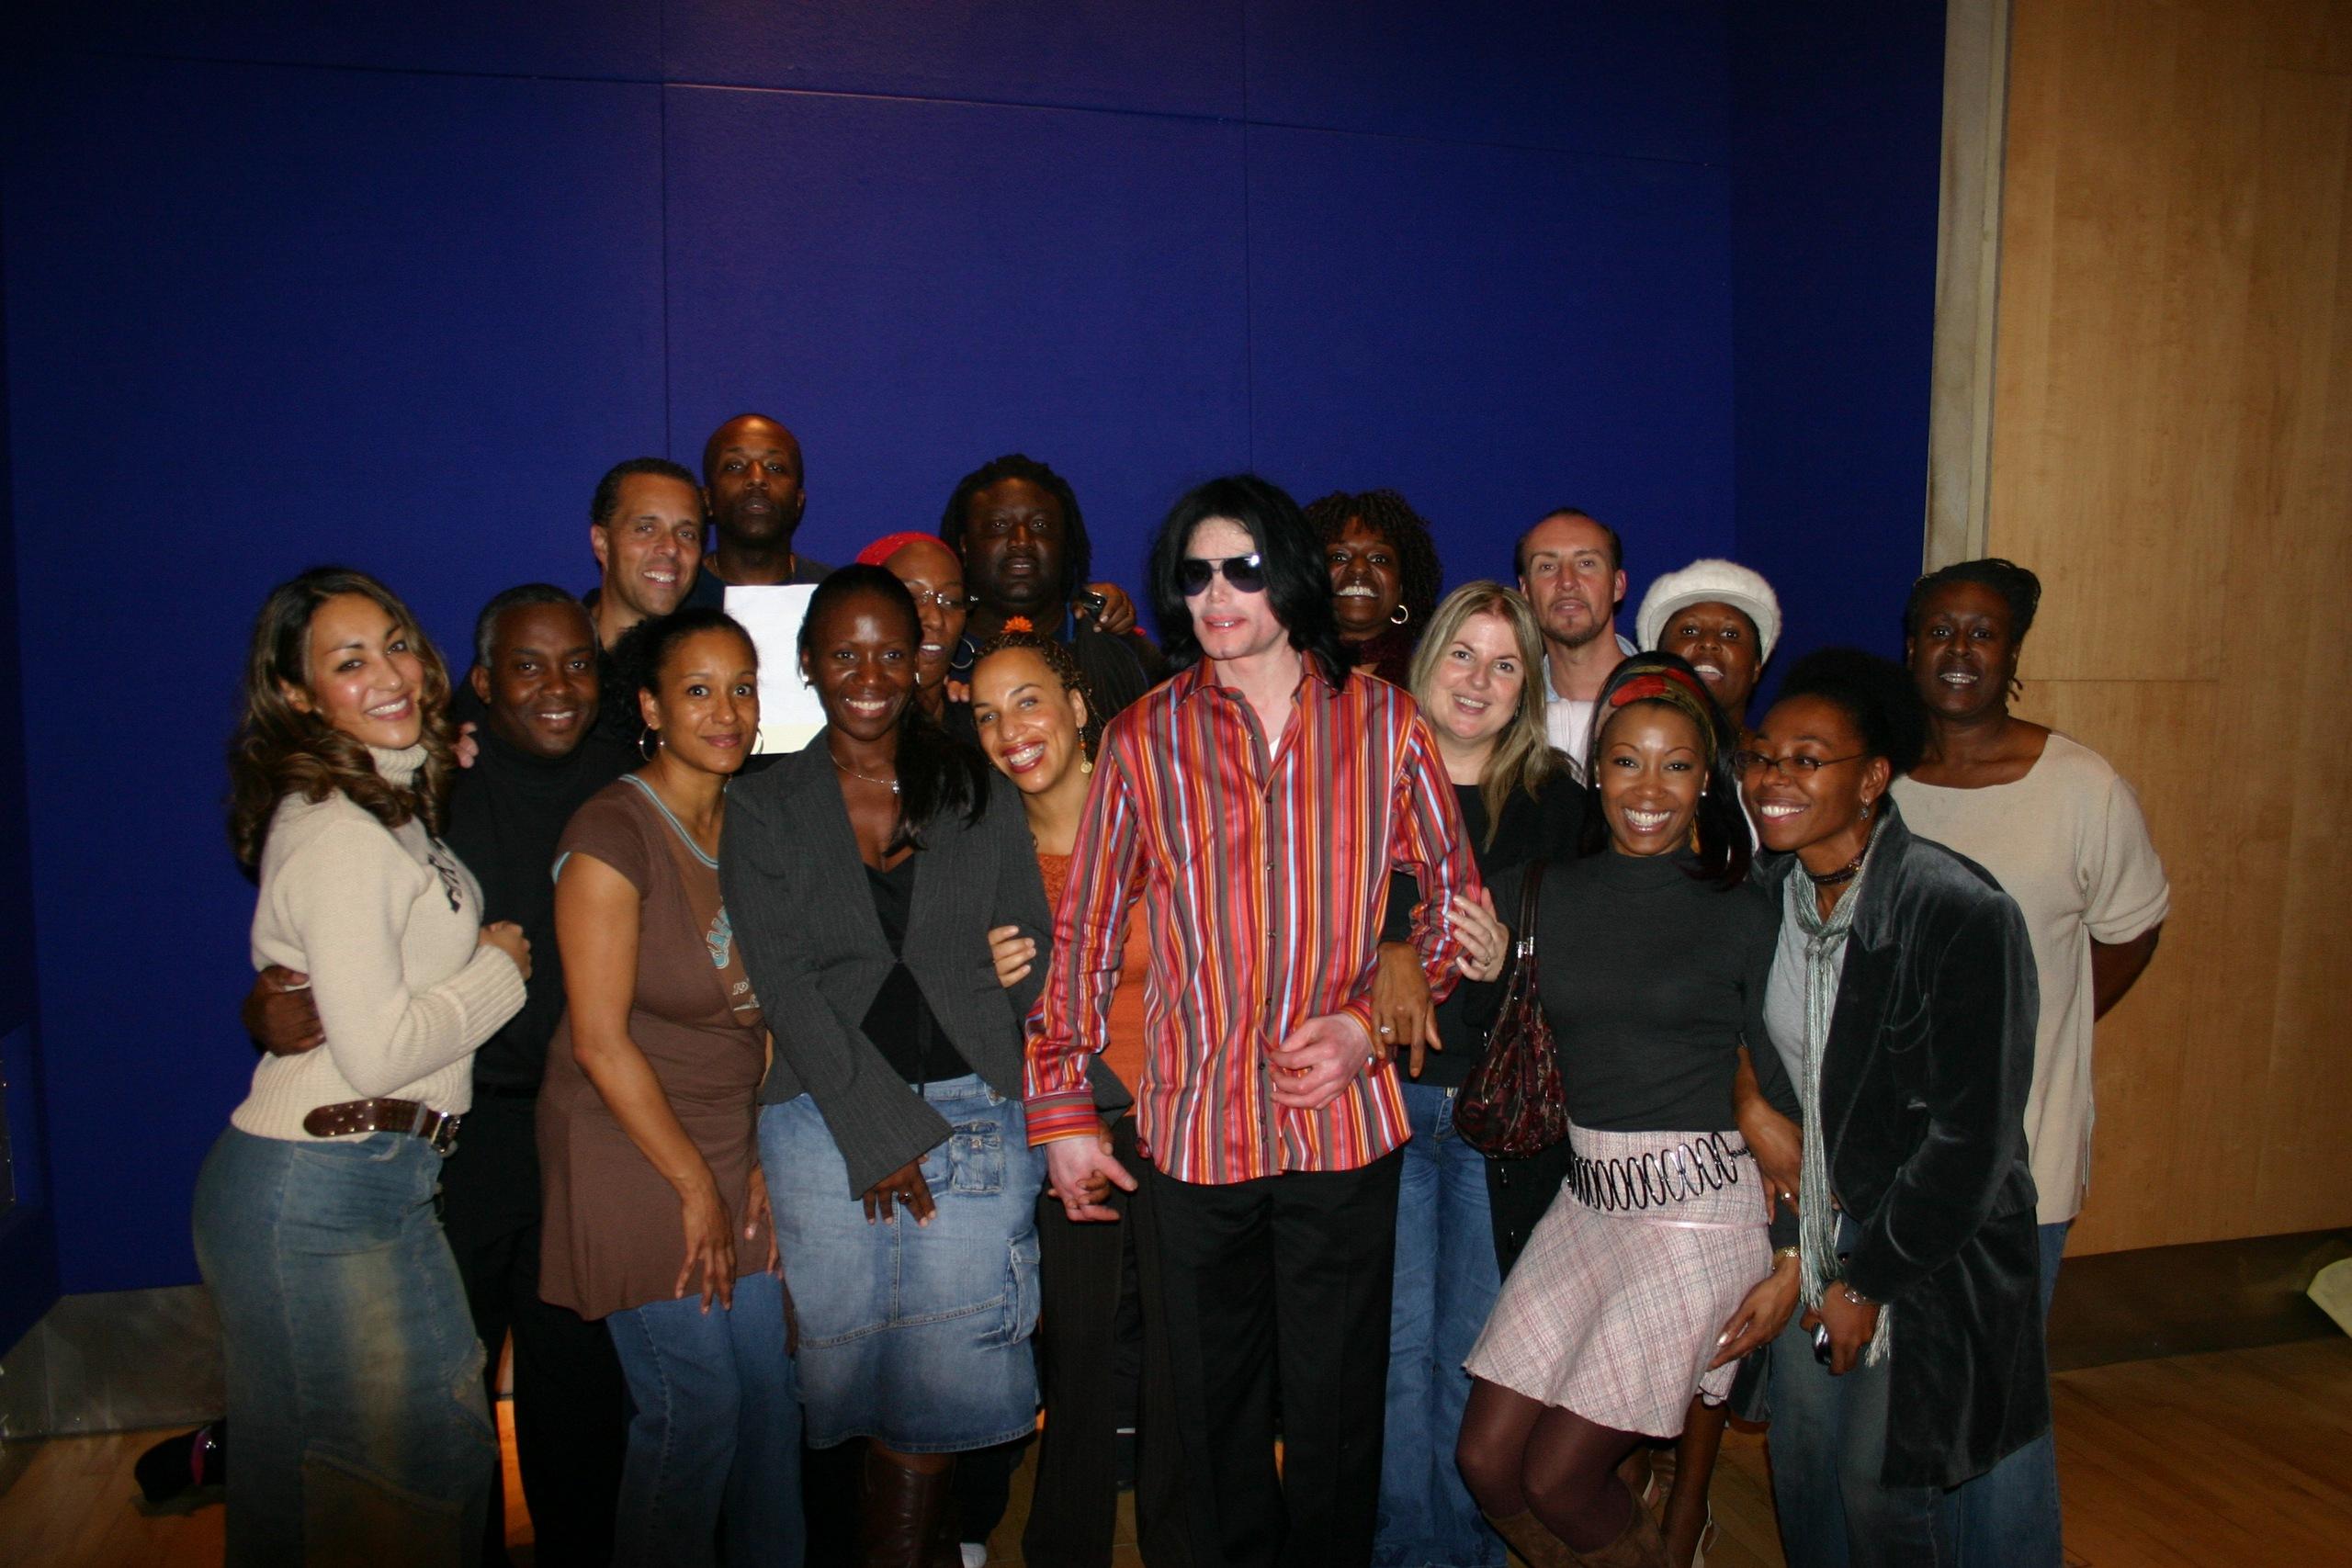 Raridades: Somente fotos RARAS de Michael Jackson. - Página 6 -michael-jackson-30629340-2560-1707